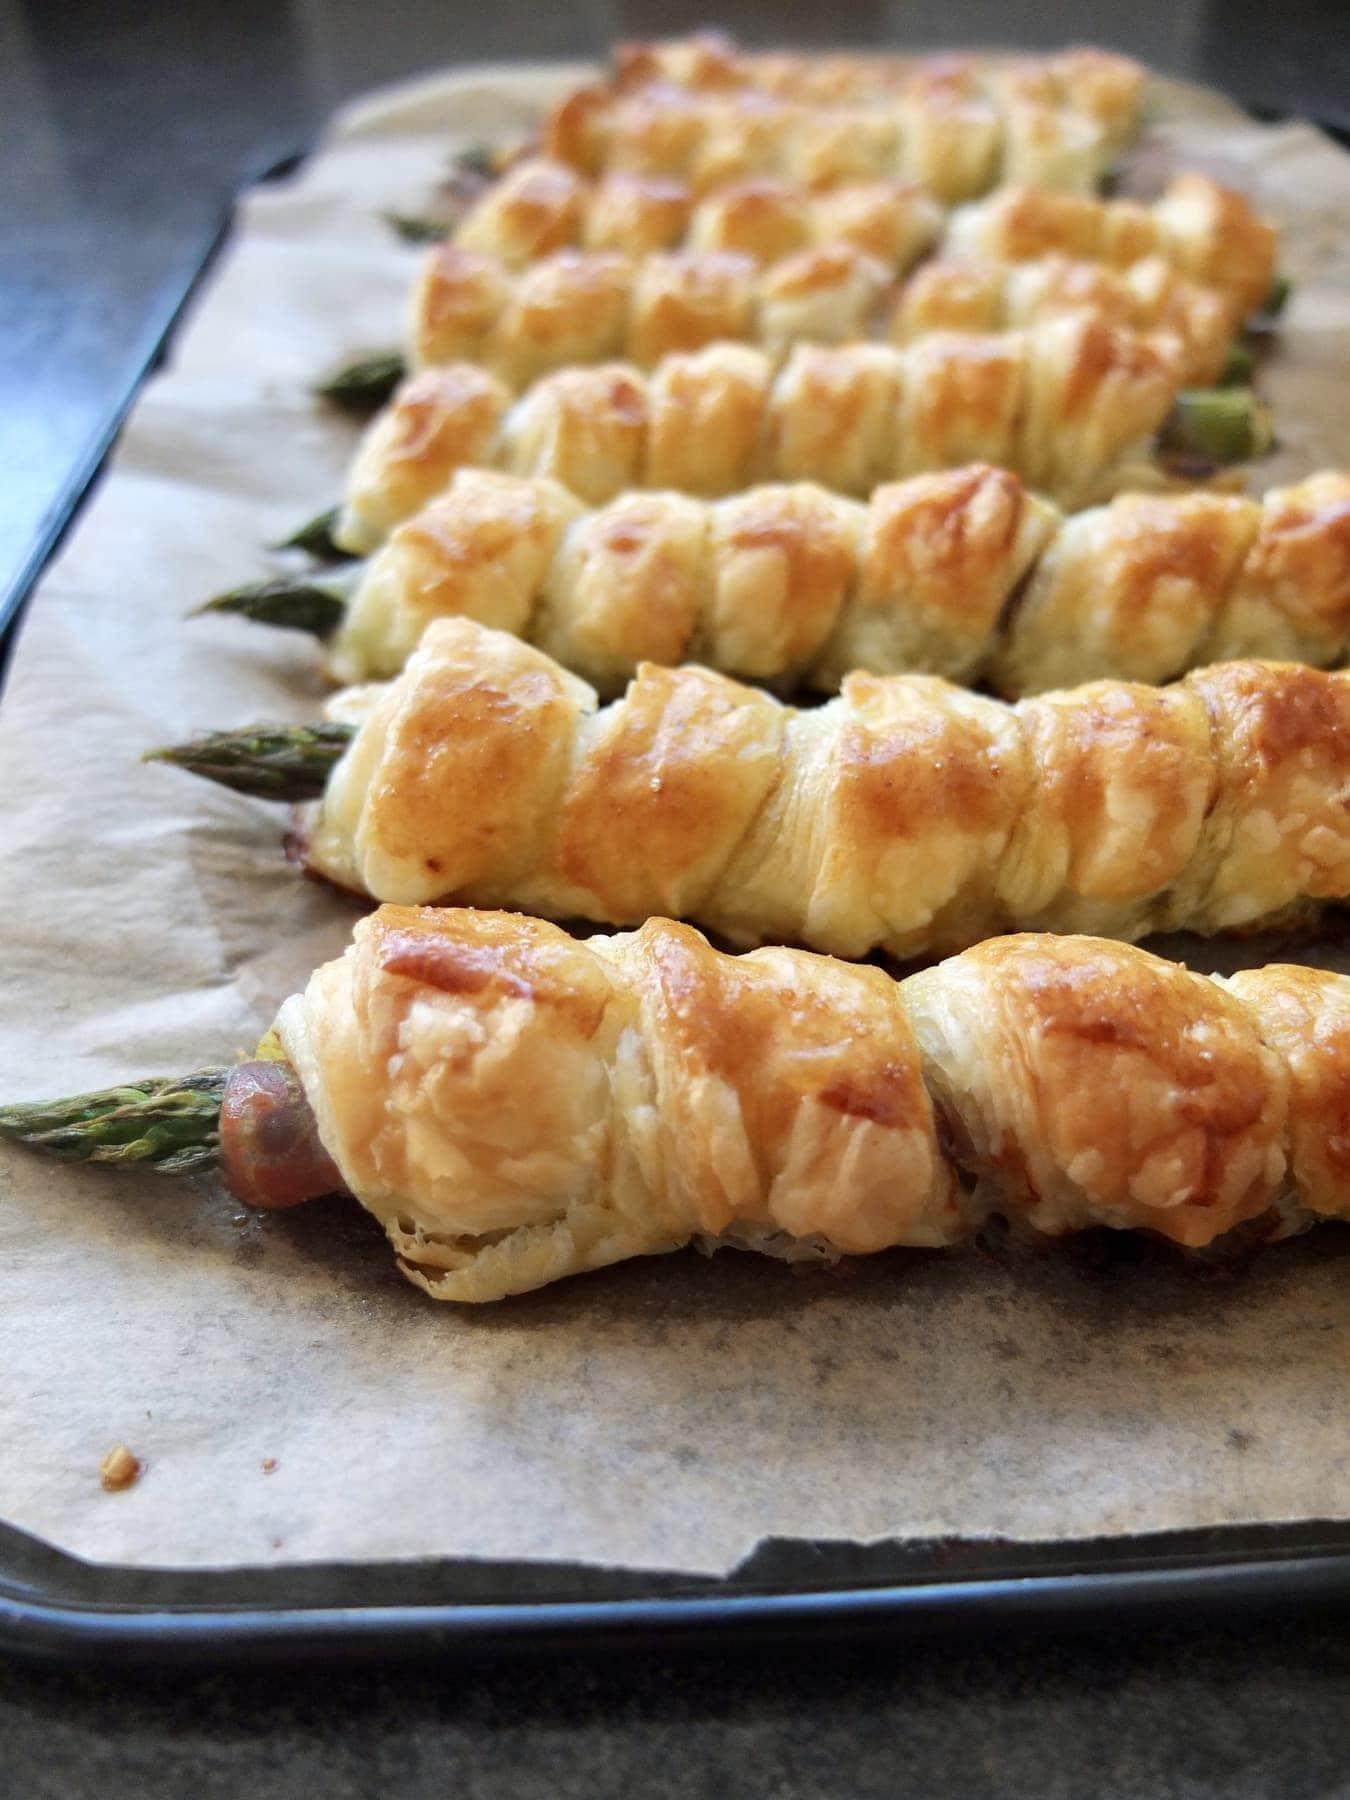 Asparagus and Parma Ham Twists with Pesto